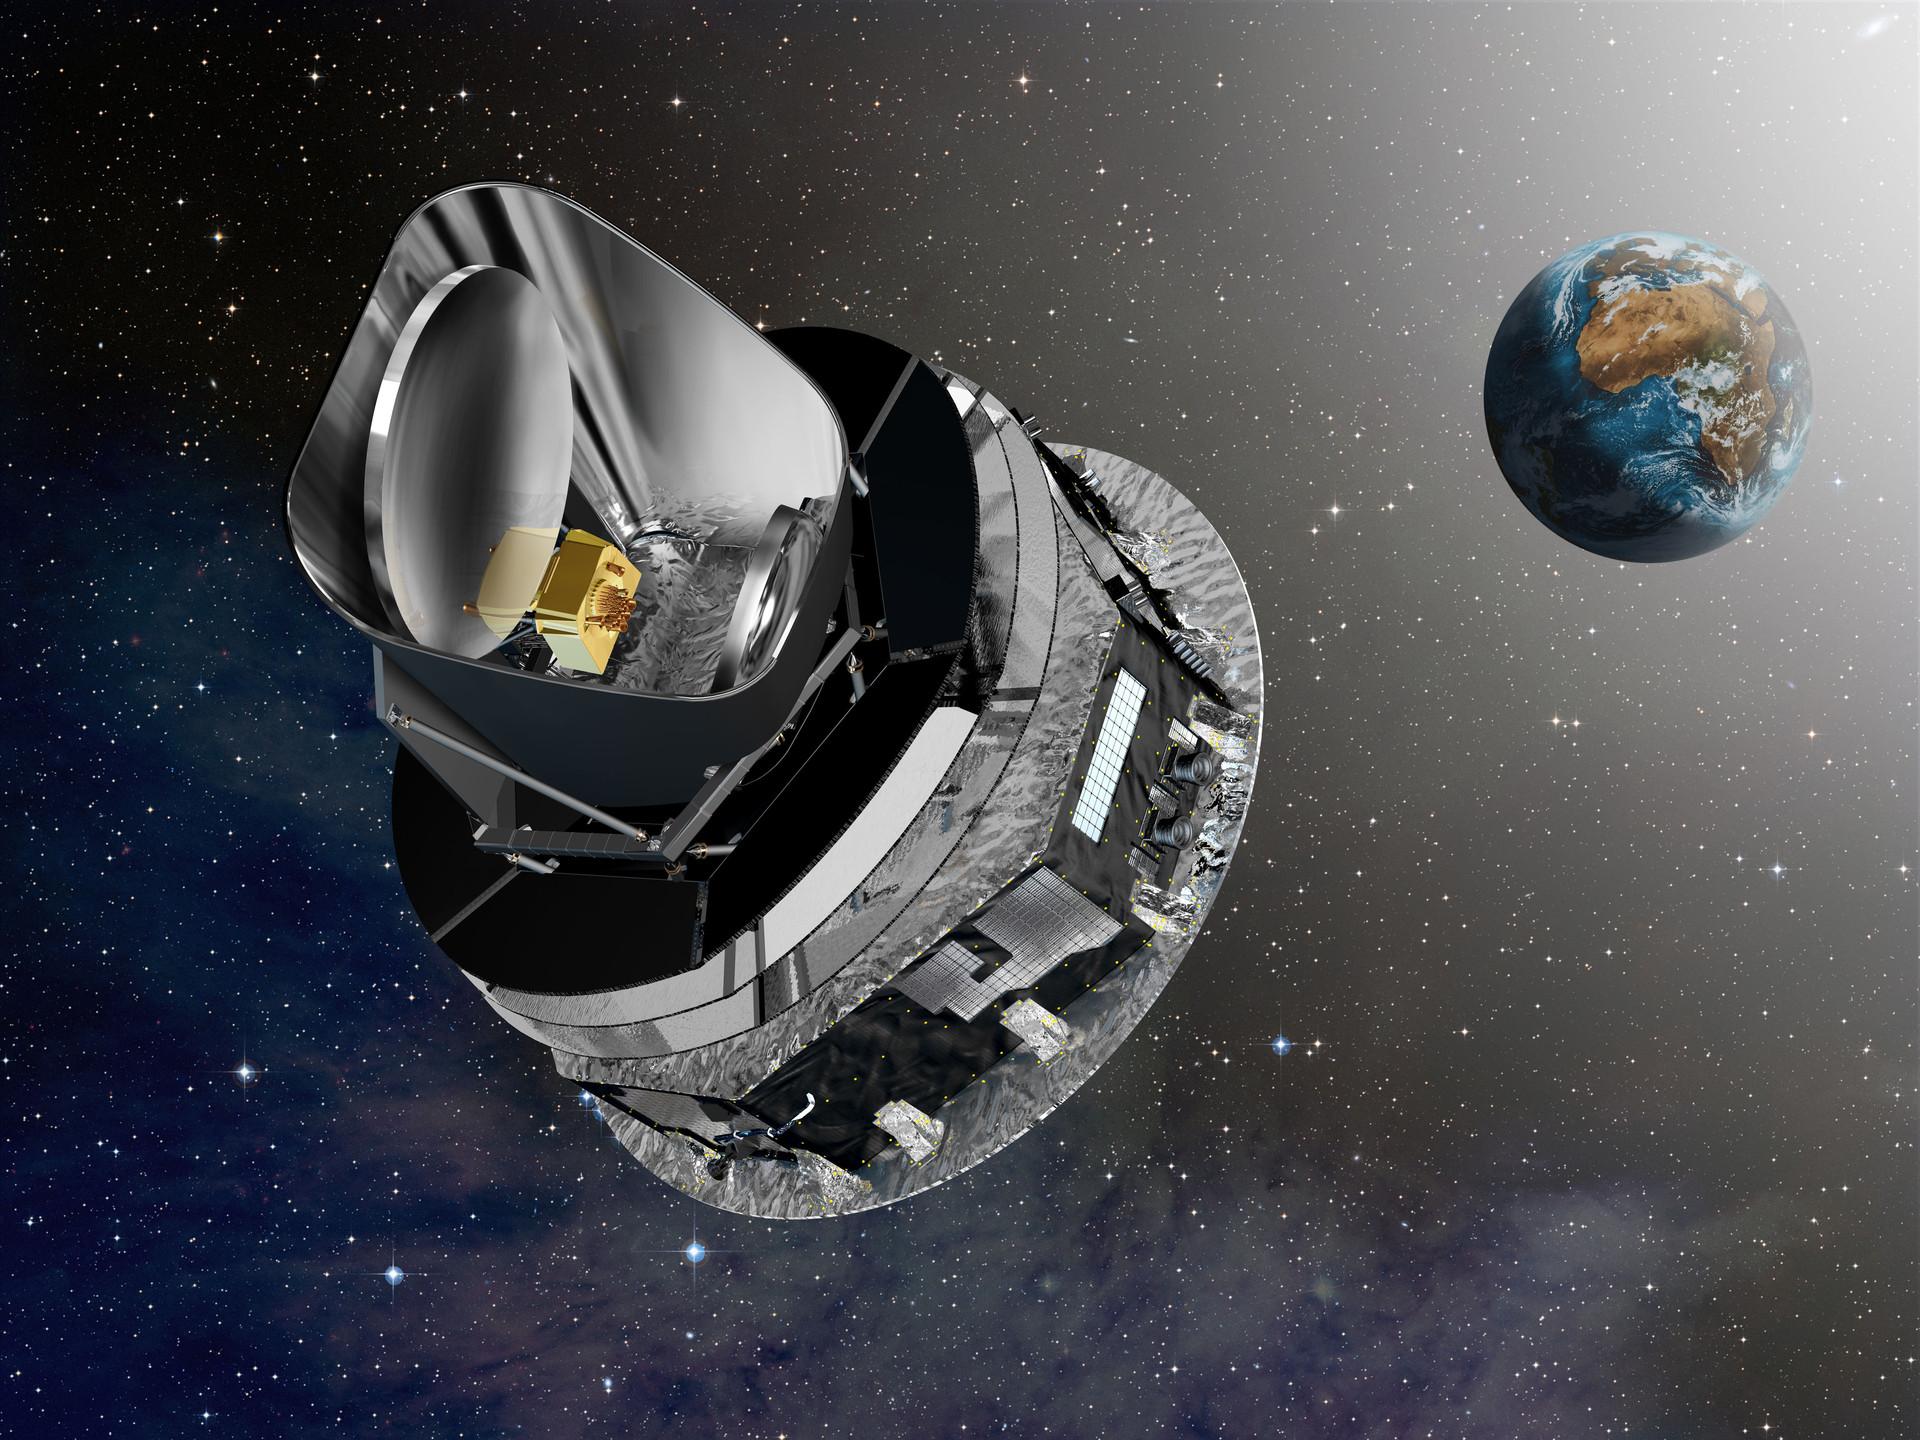 The planck satellite to its work orbit (artist's view)